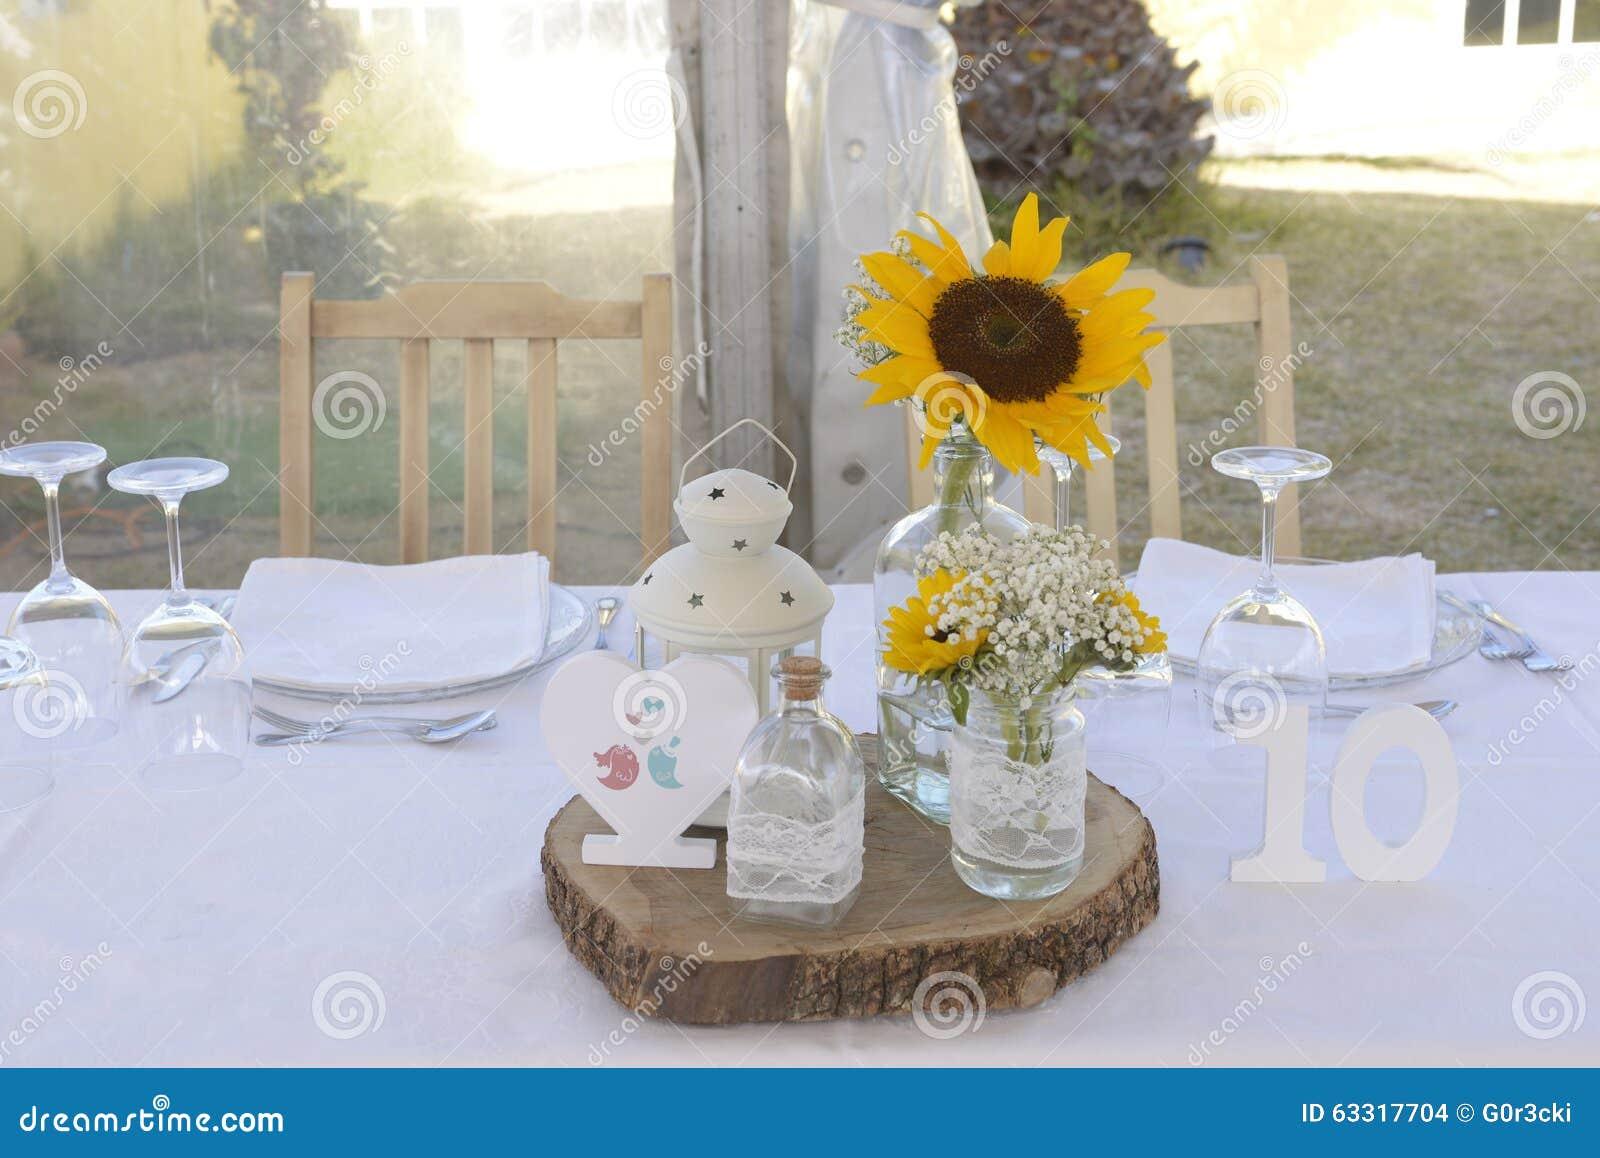 Sunflowers centerpiece table ten decoration stock